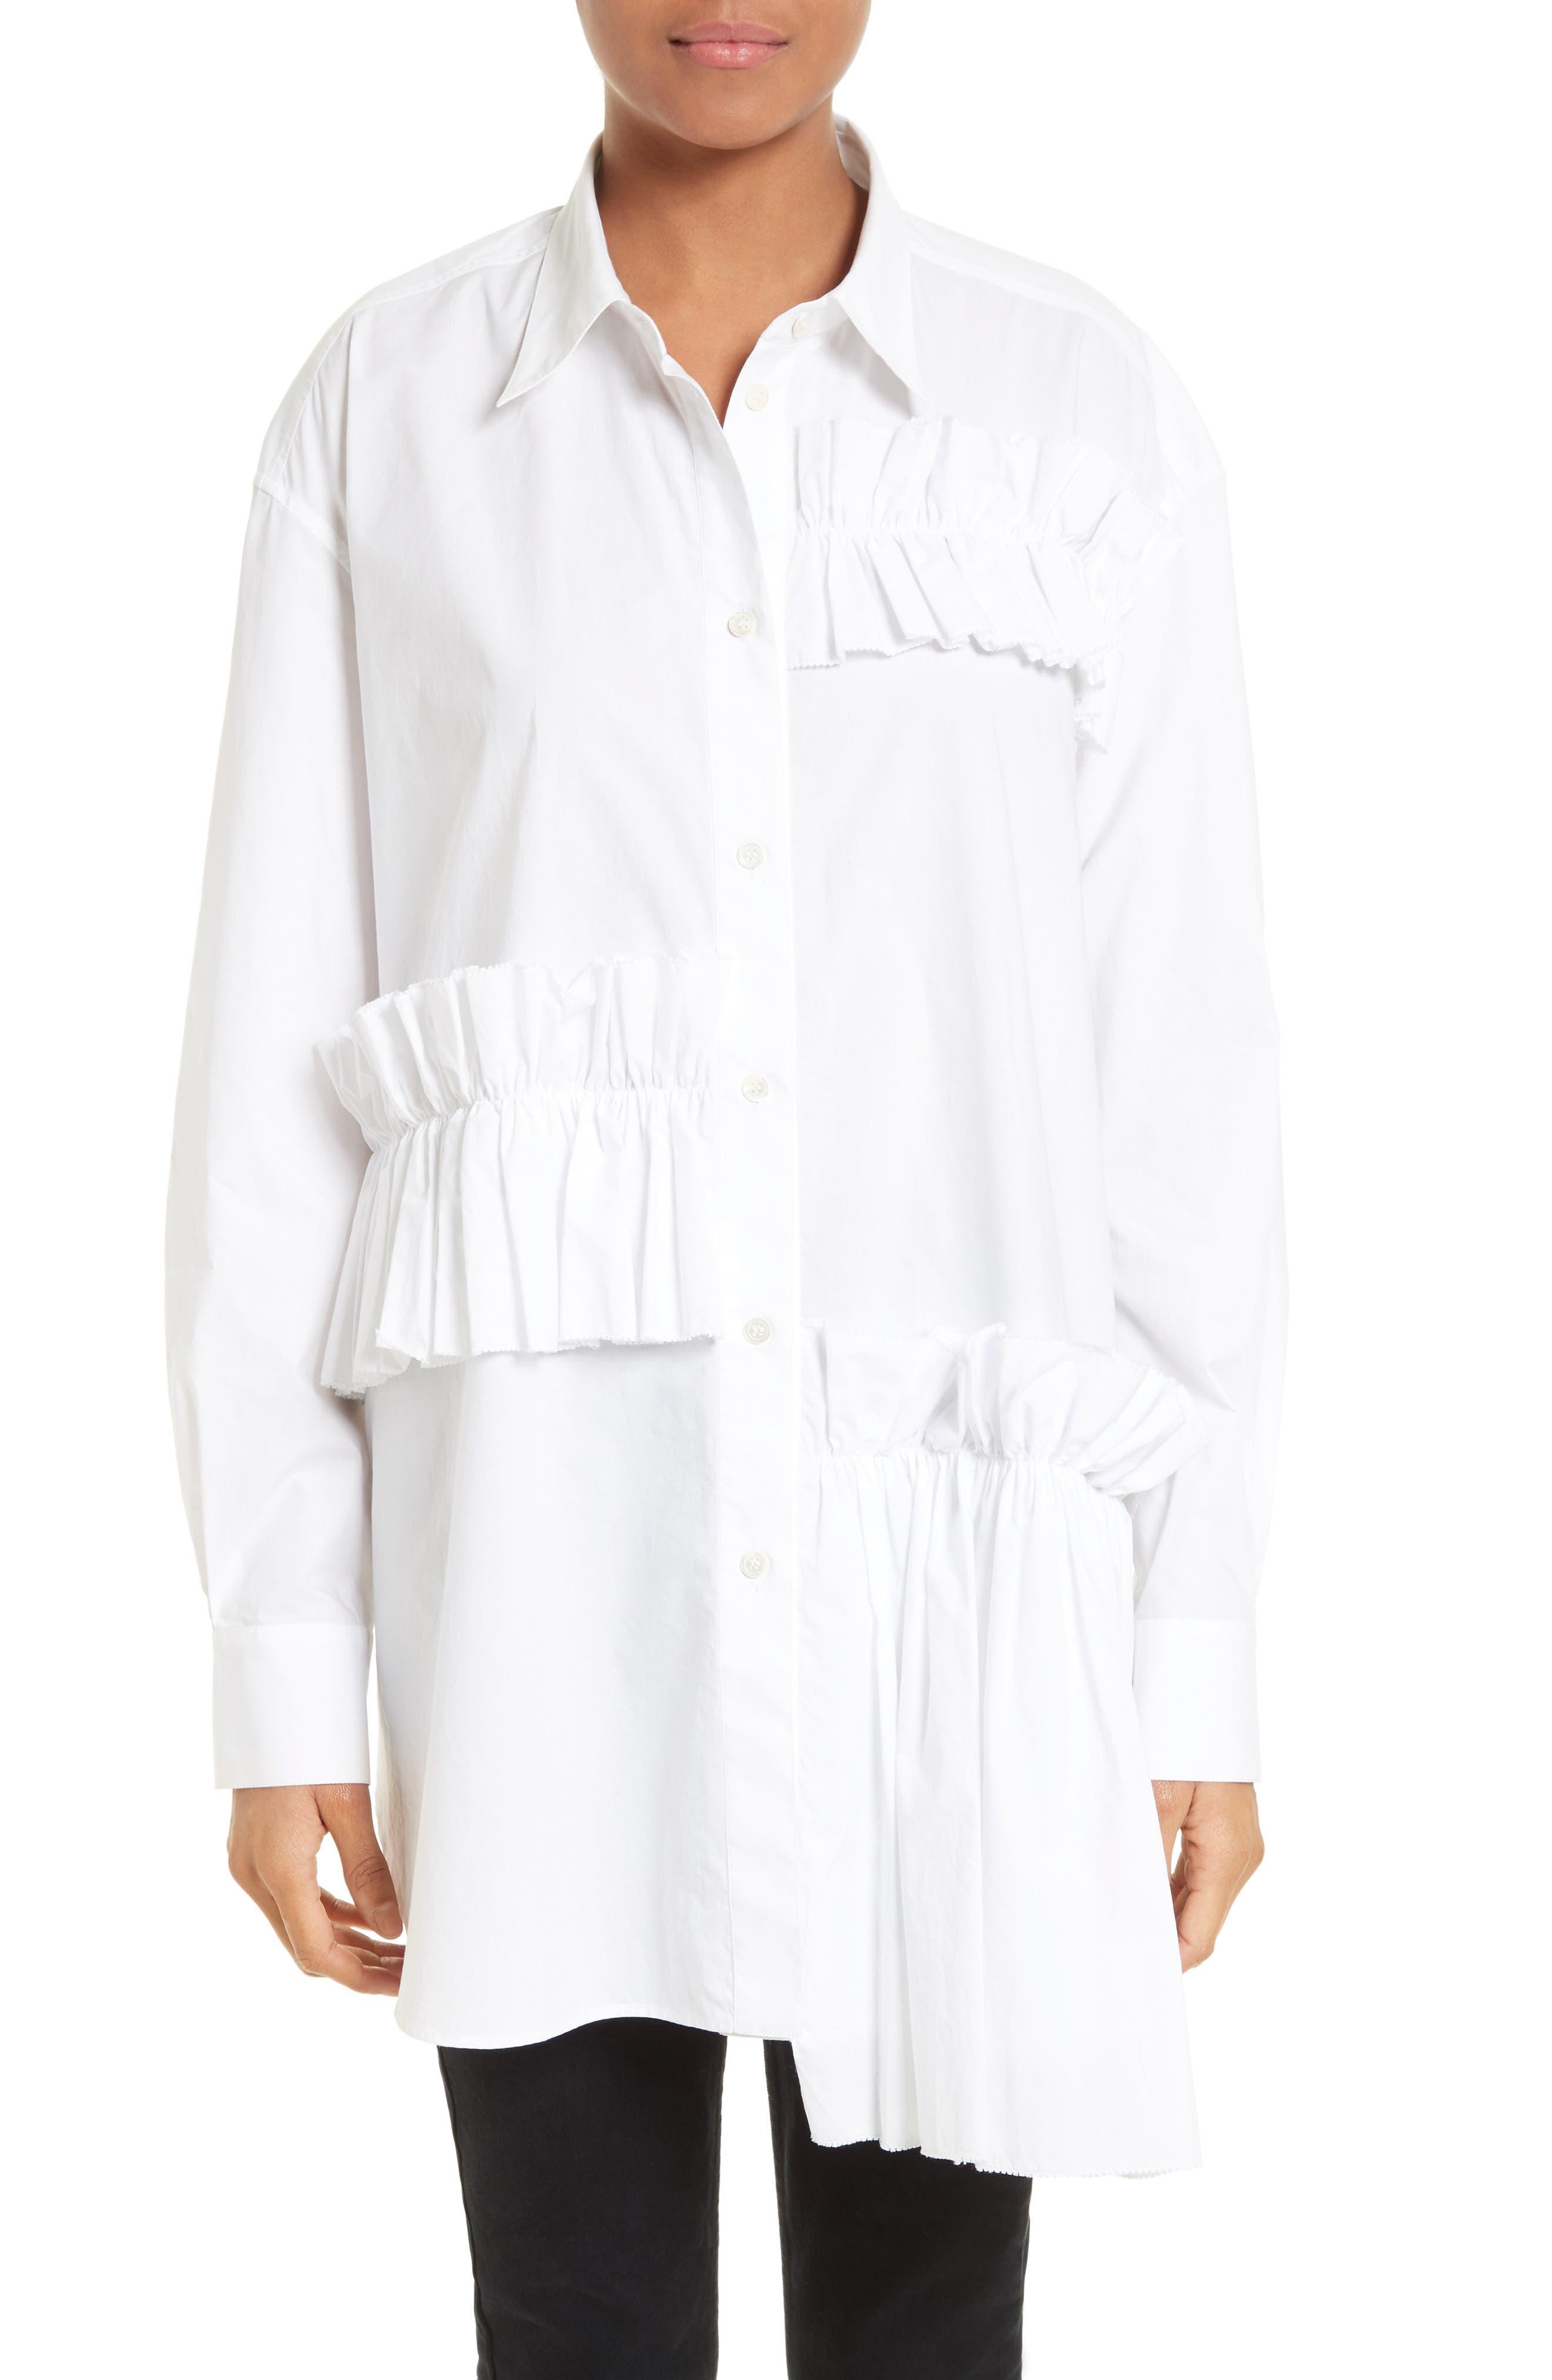 McQ Alexander McQueen Ruffle Tunic Shirt